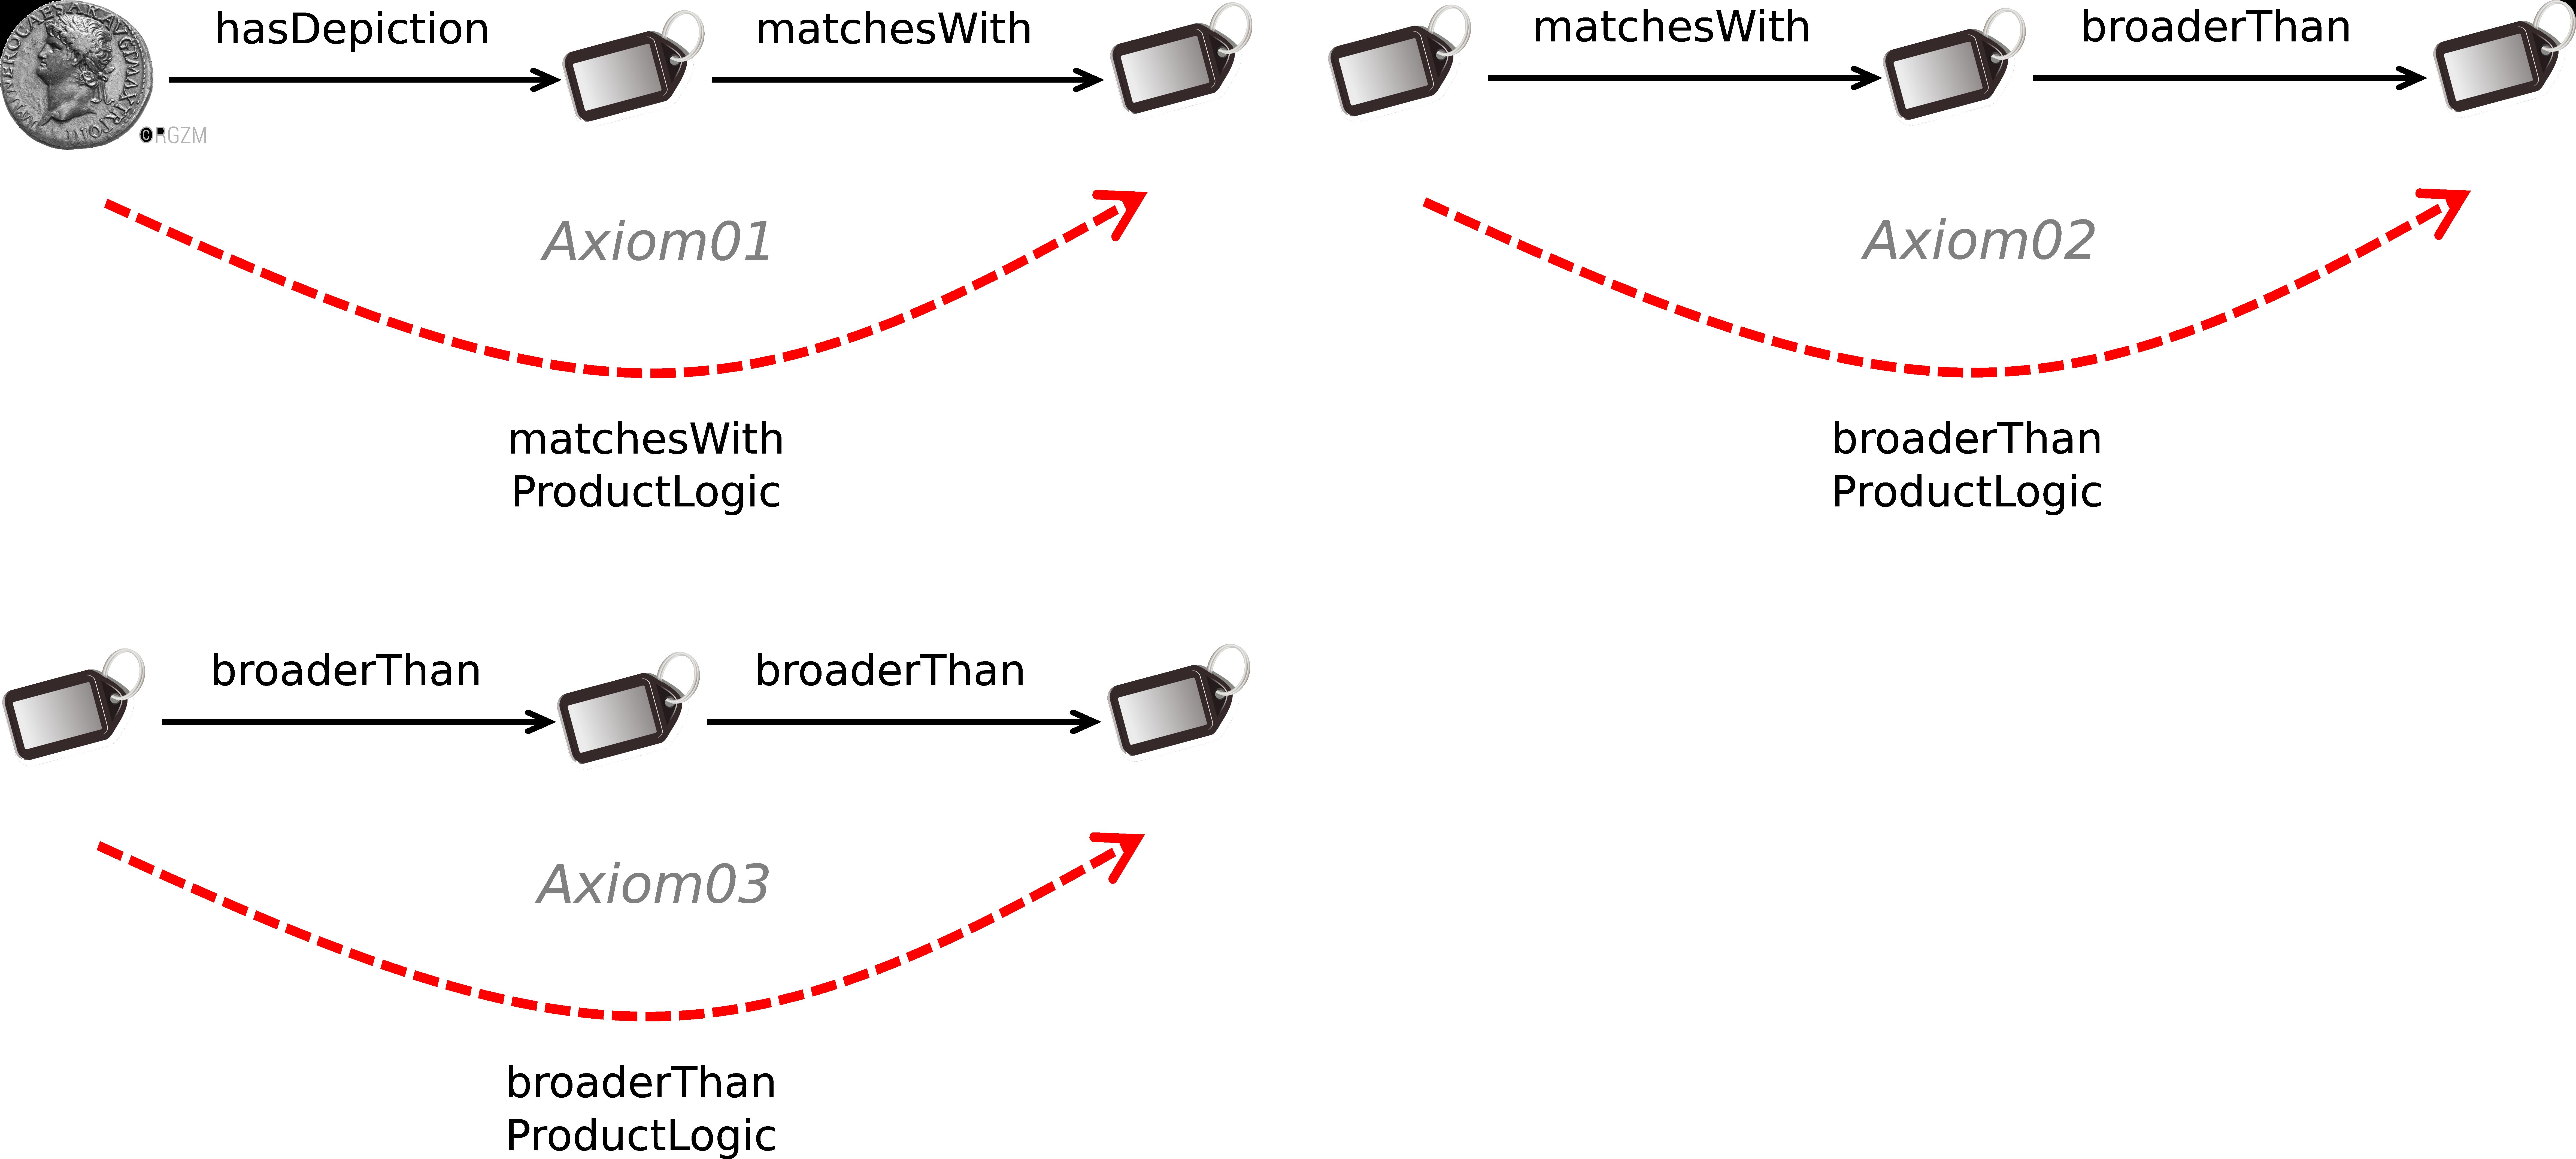 Abb. 13: Rollen-Kettenregeln der navis                            ontology. [Eigene Darstellung, CC BY 4.0].